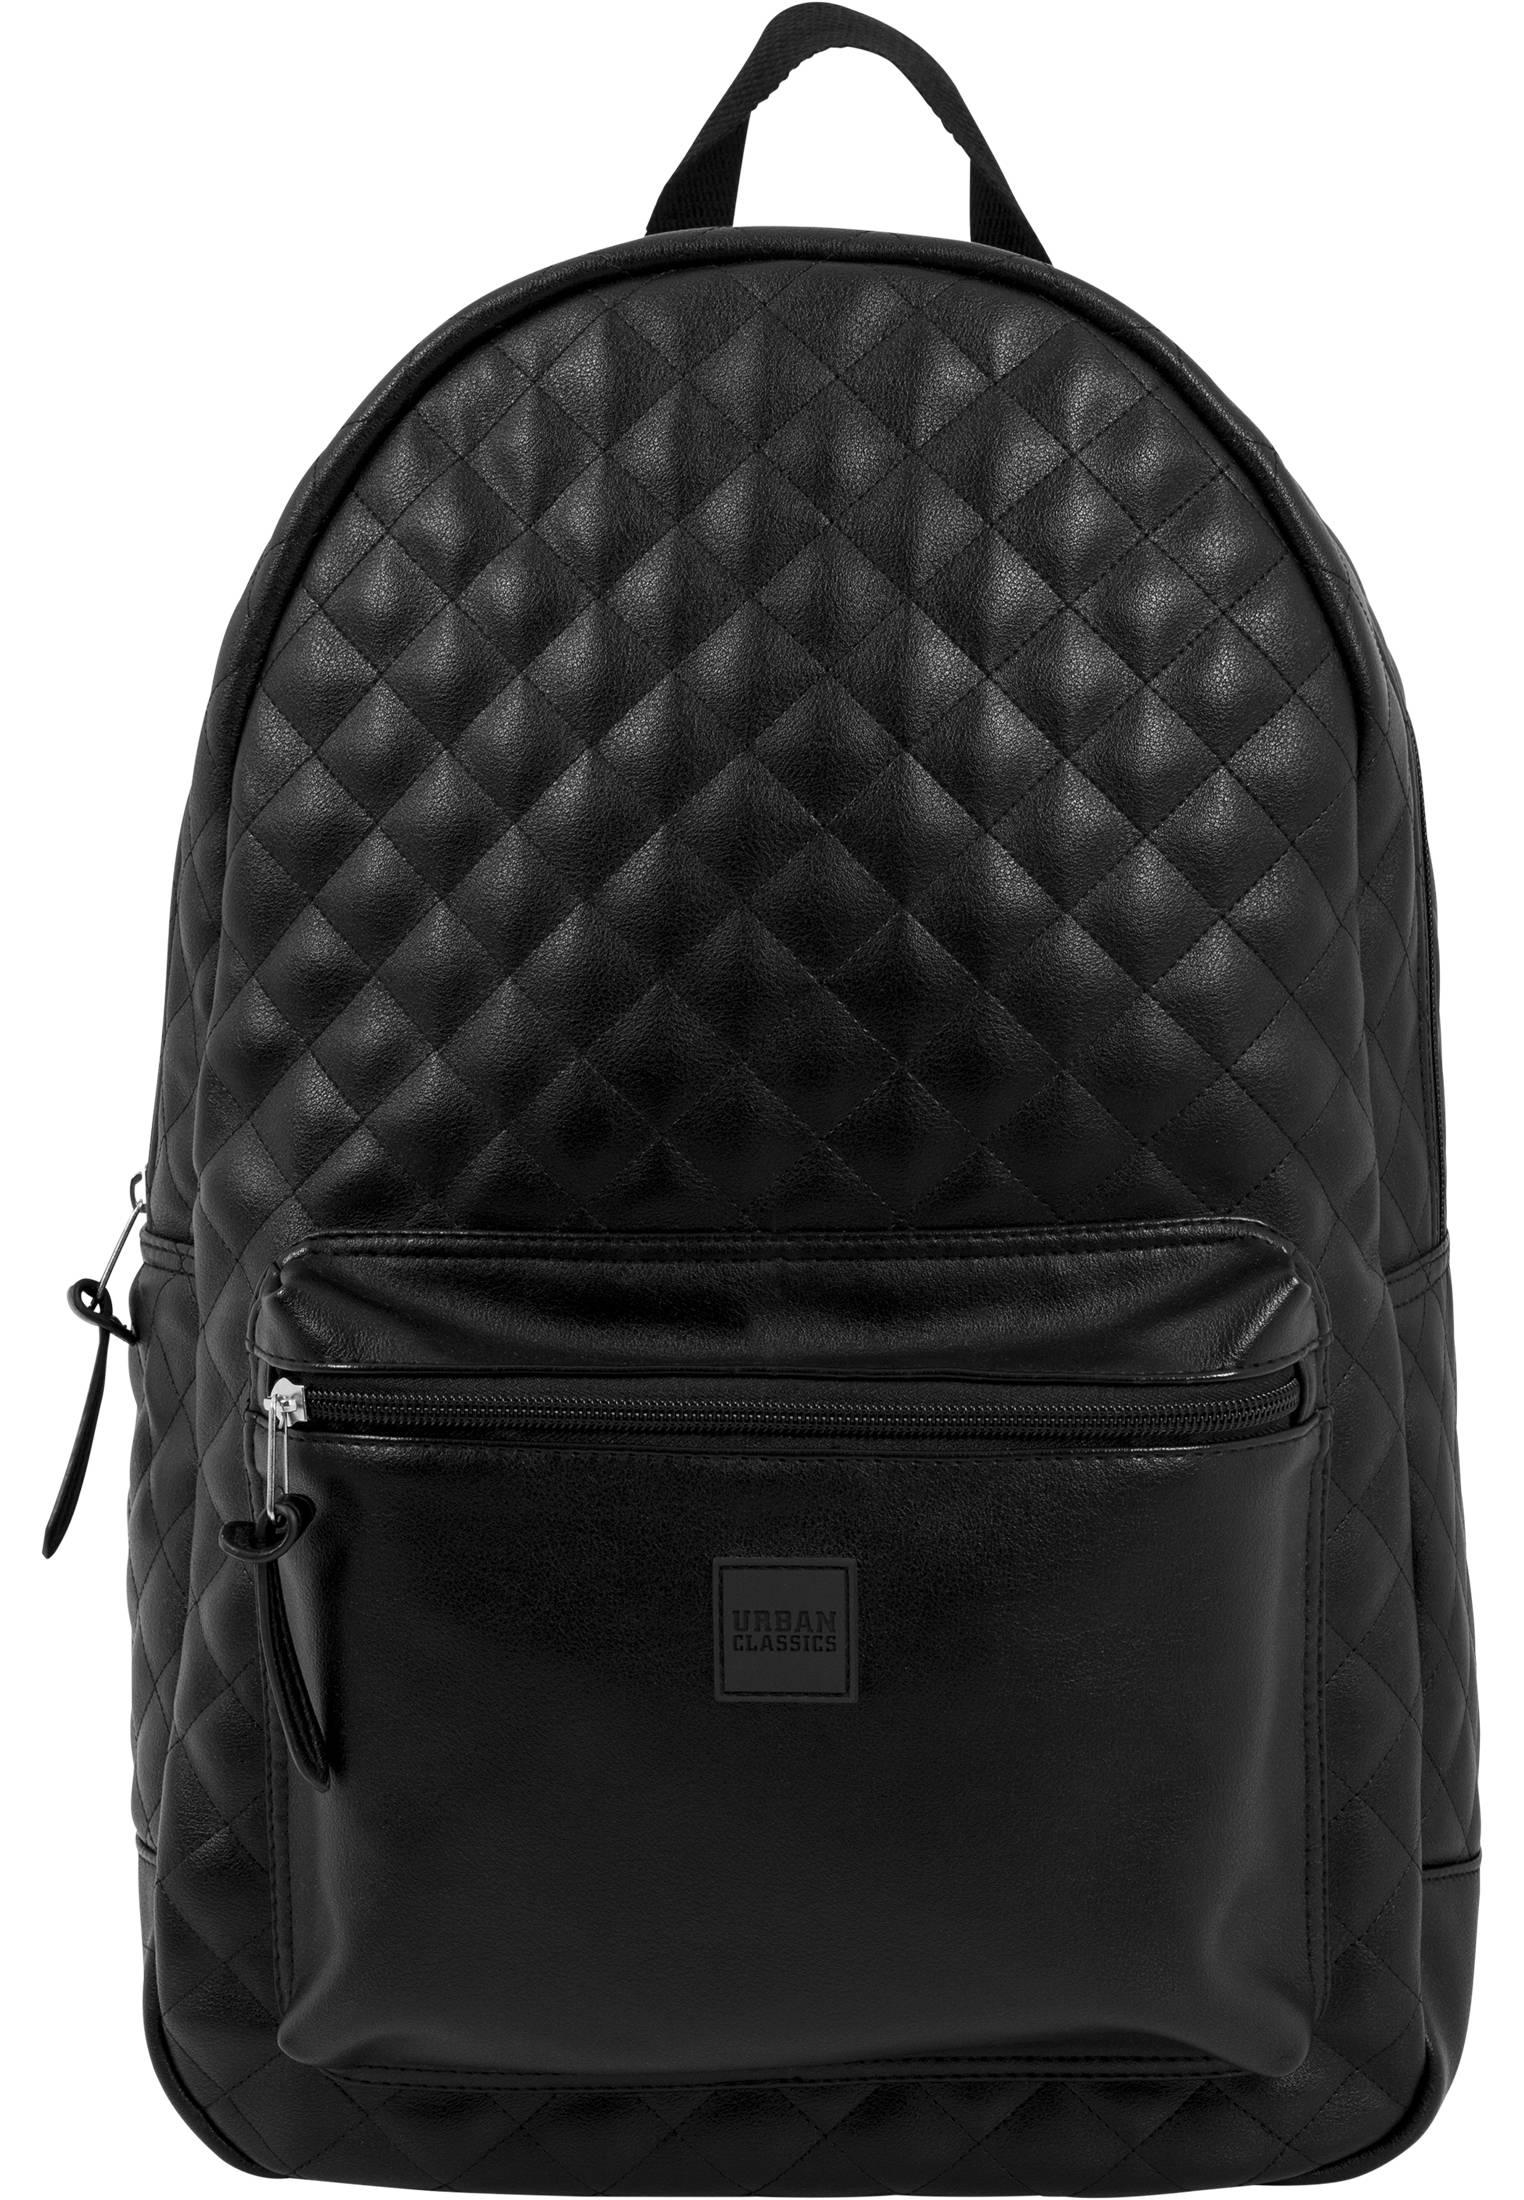 Urban Classics Diamond Quilt Leather Imitation Backpack black - One Size